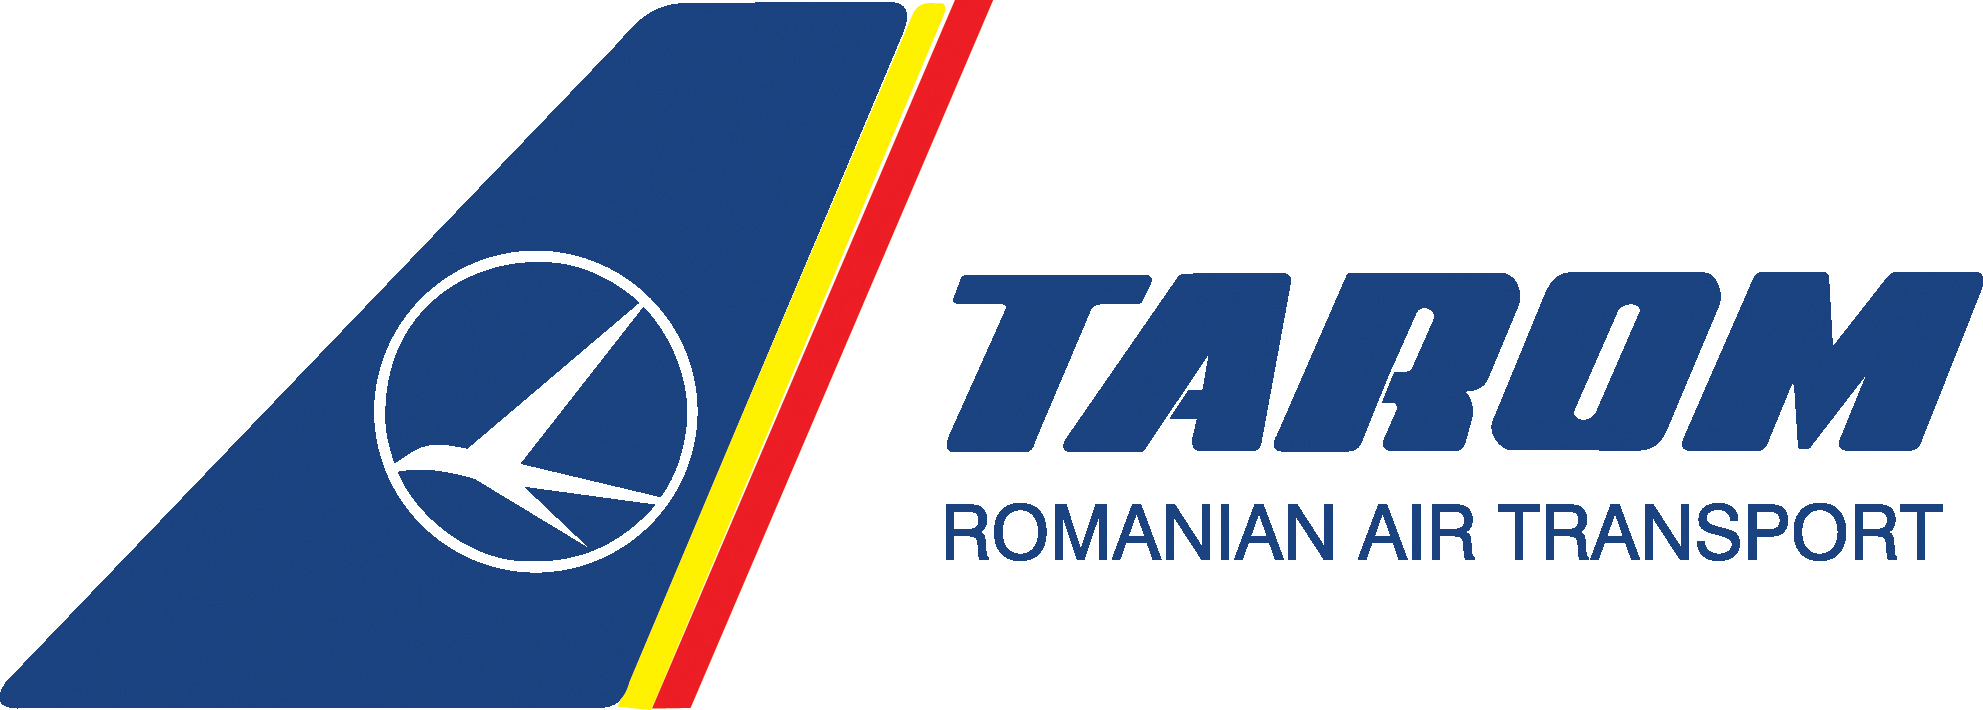 Tarom Romanian Air Logo departing from Luton Airport